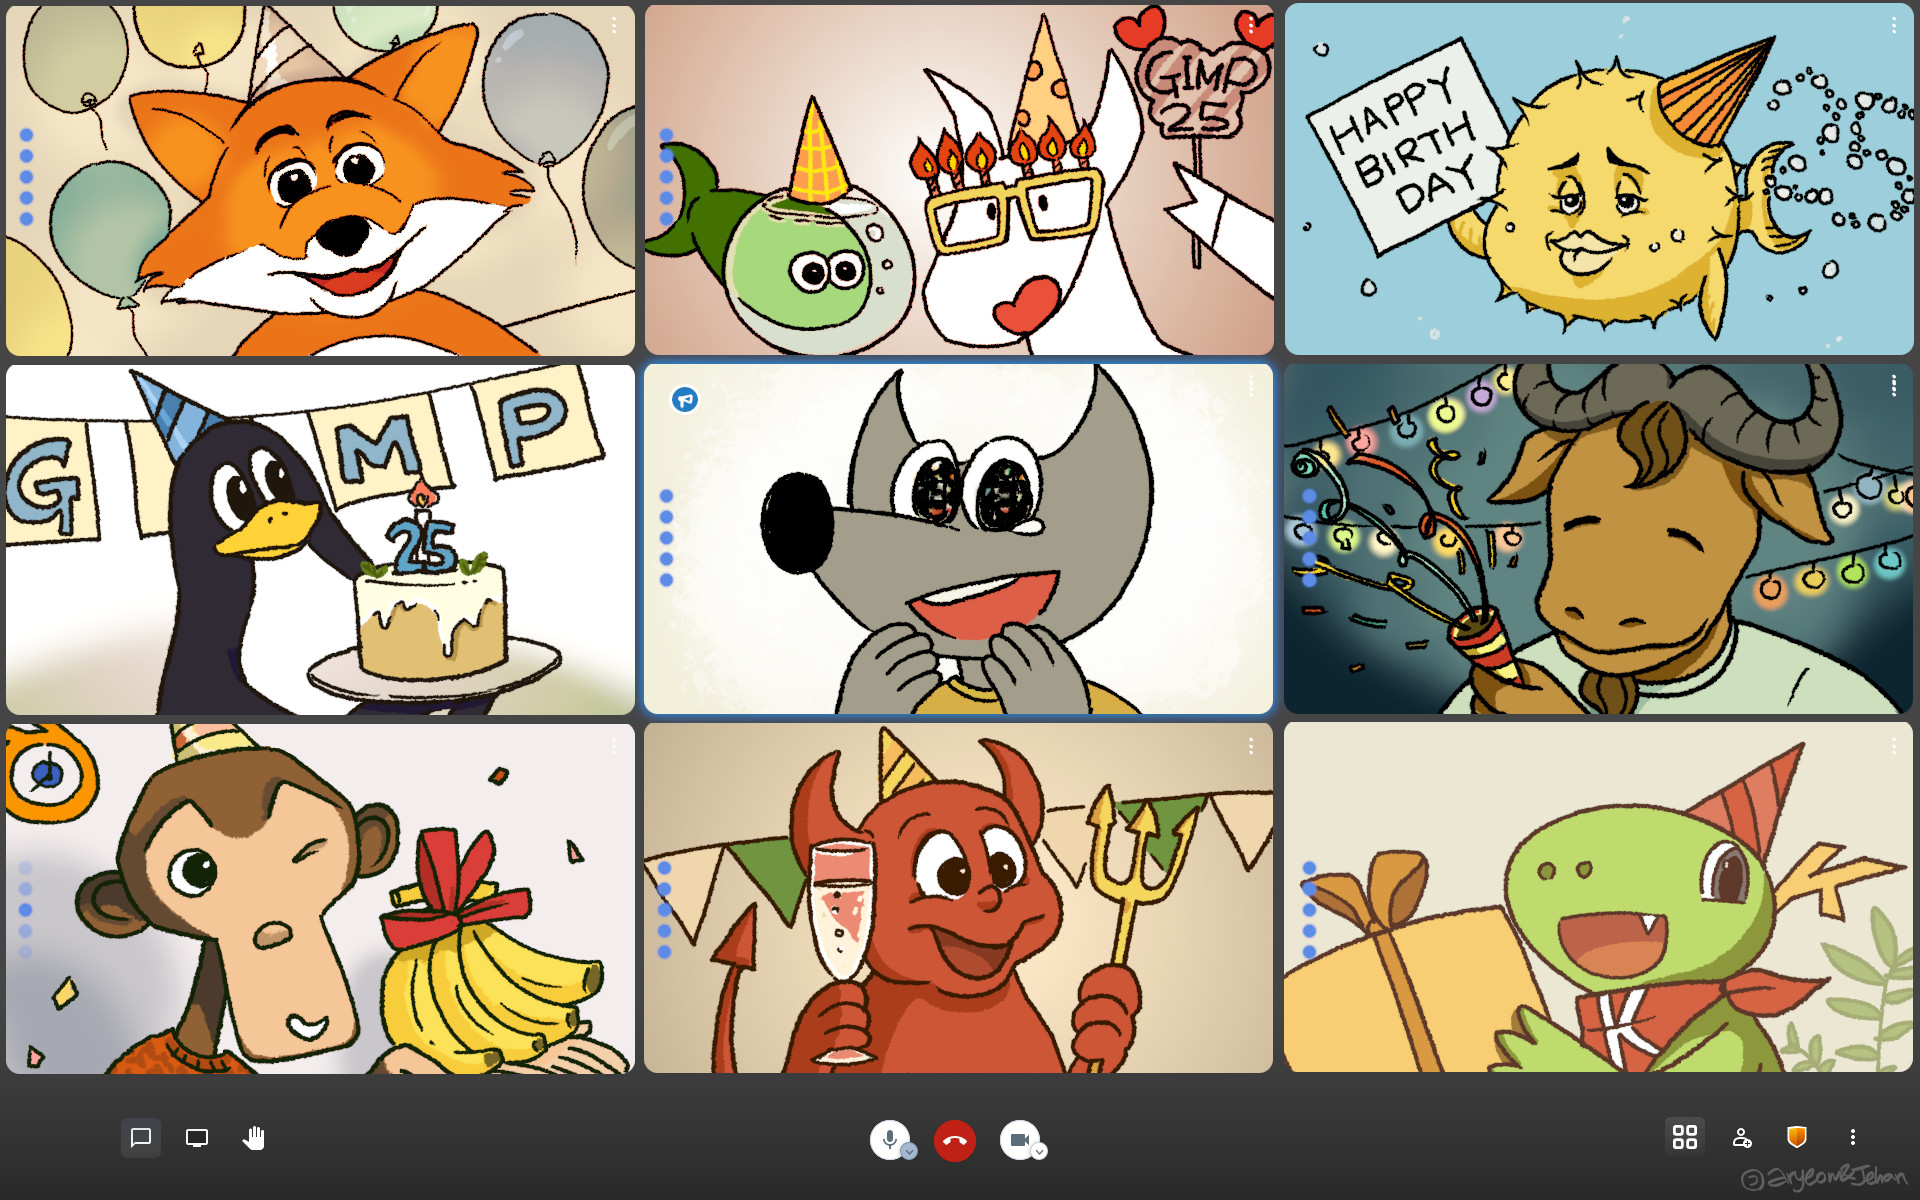 GIMP 诞生 25 周年